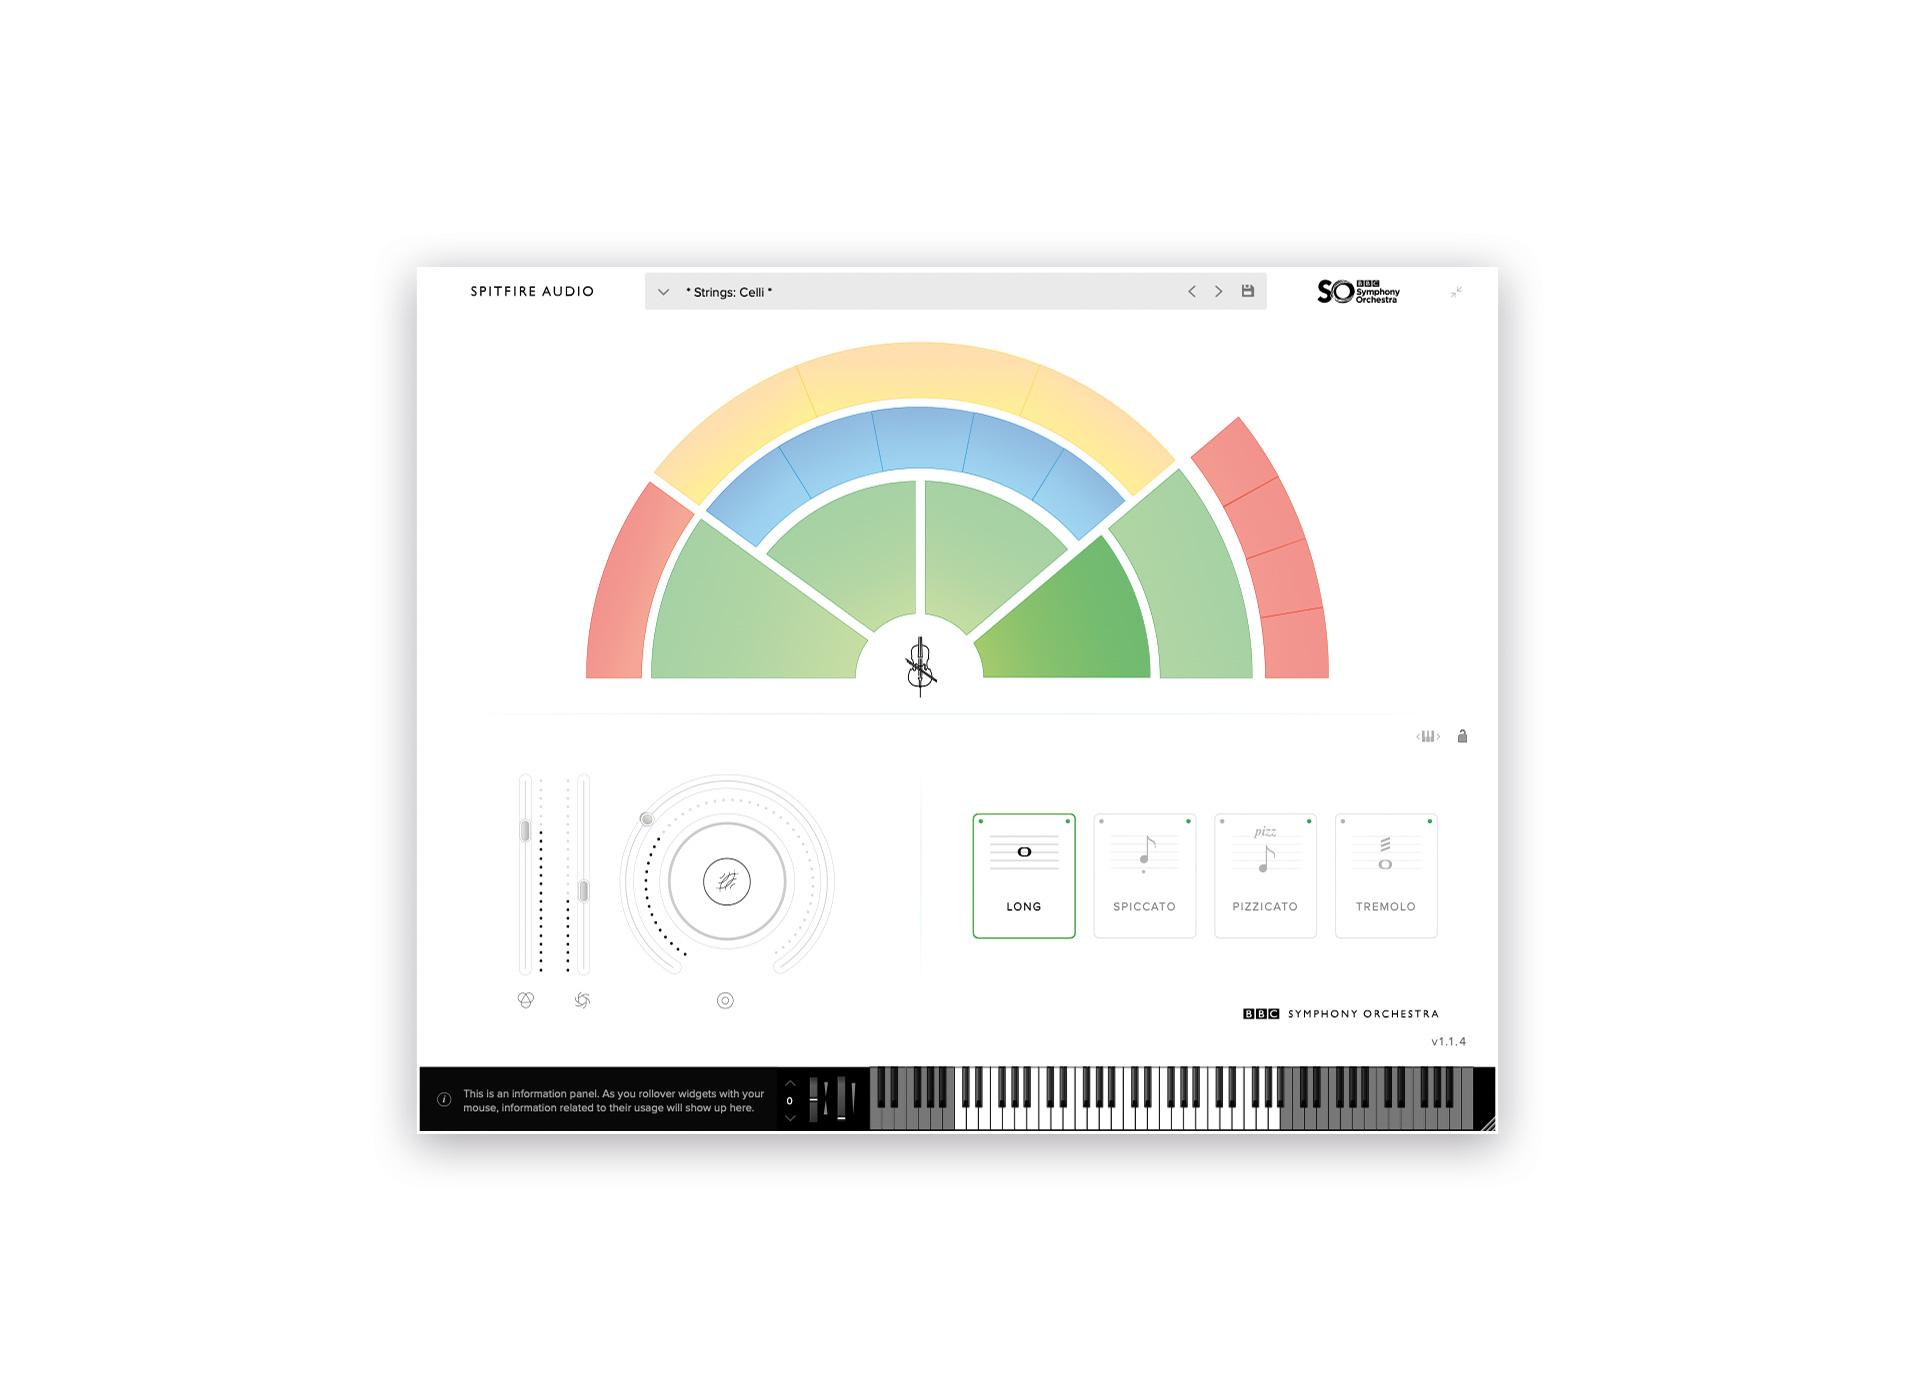 Spitfire BBC Symphony Orchestra Discover sample library virtual instrument music score soundtrack strumenti musicali